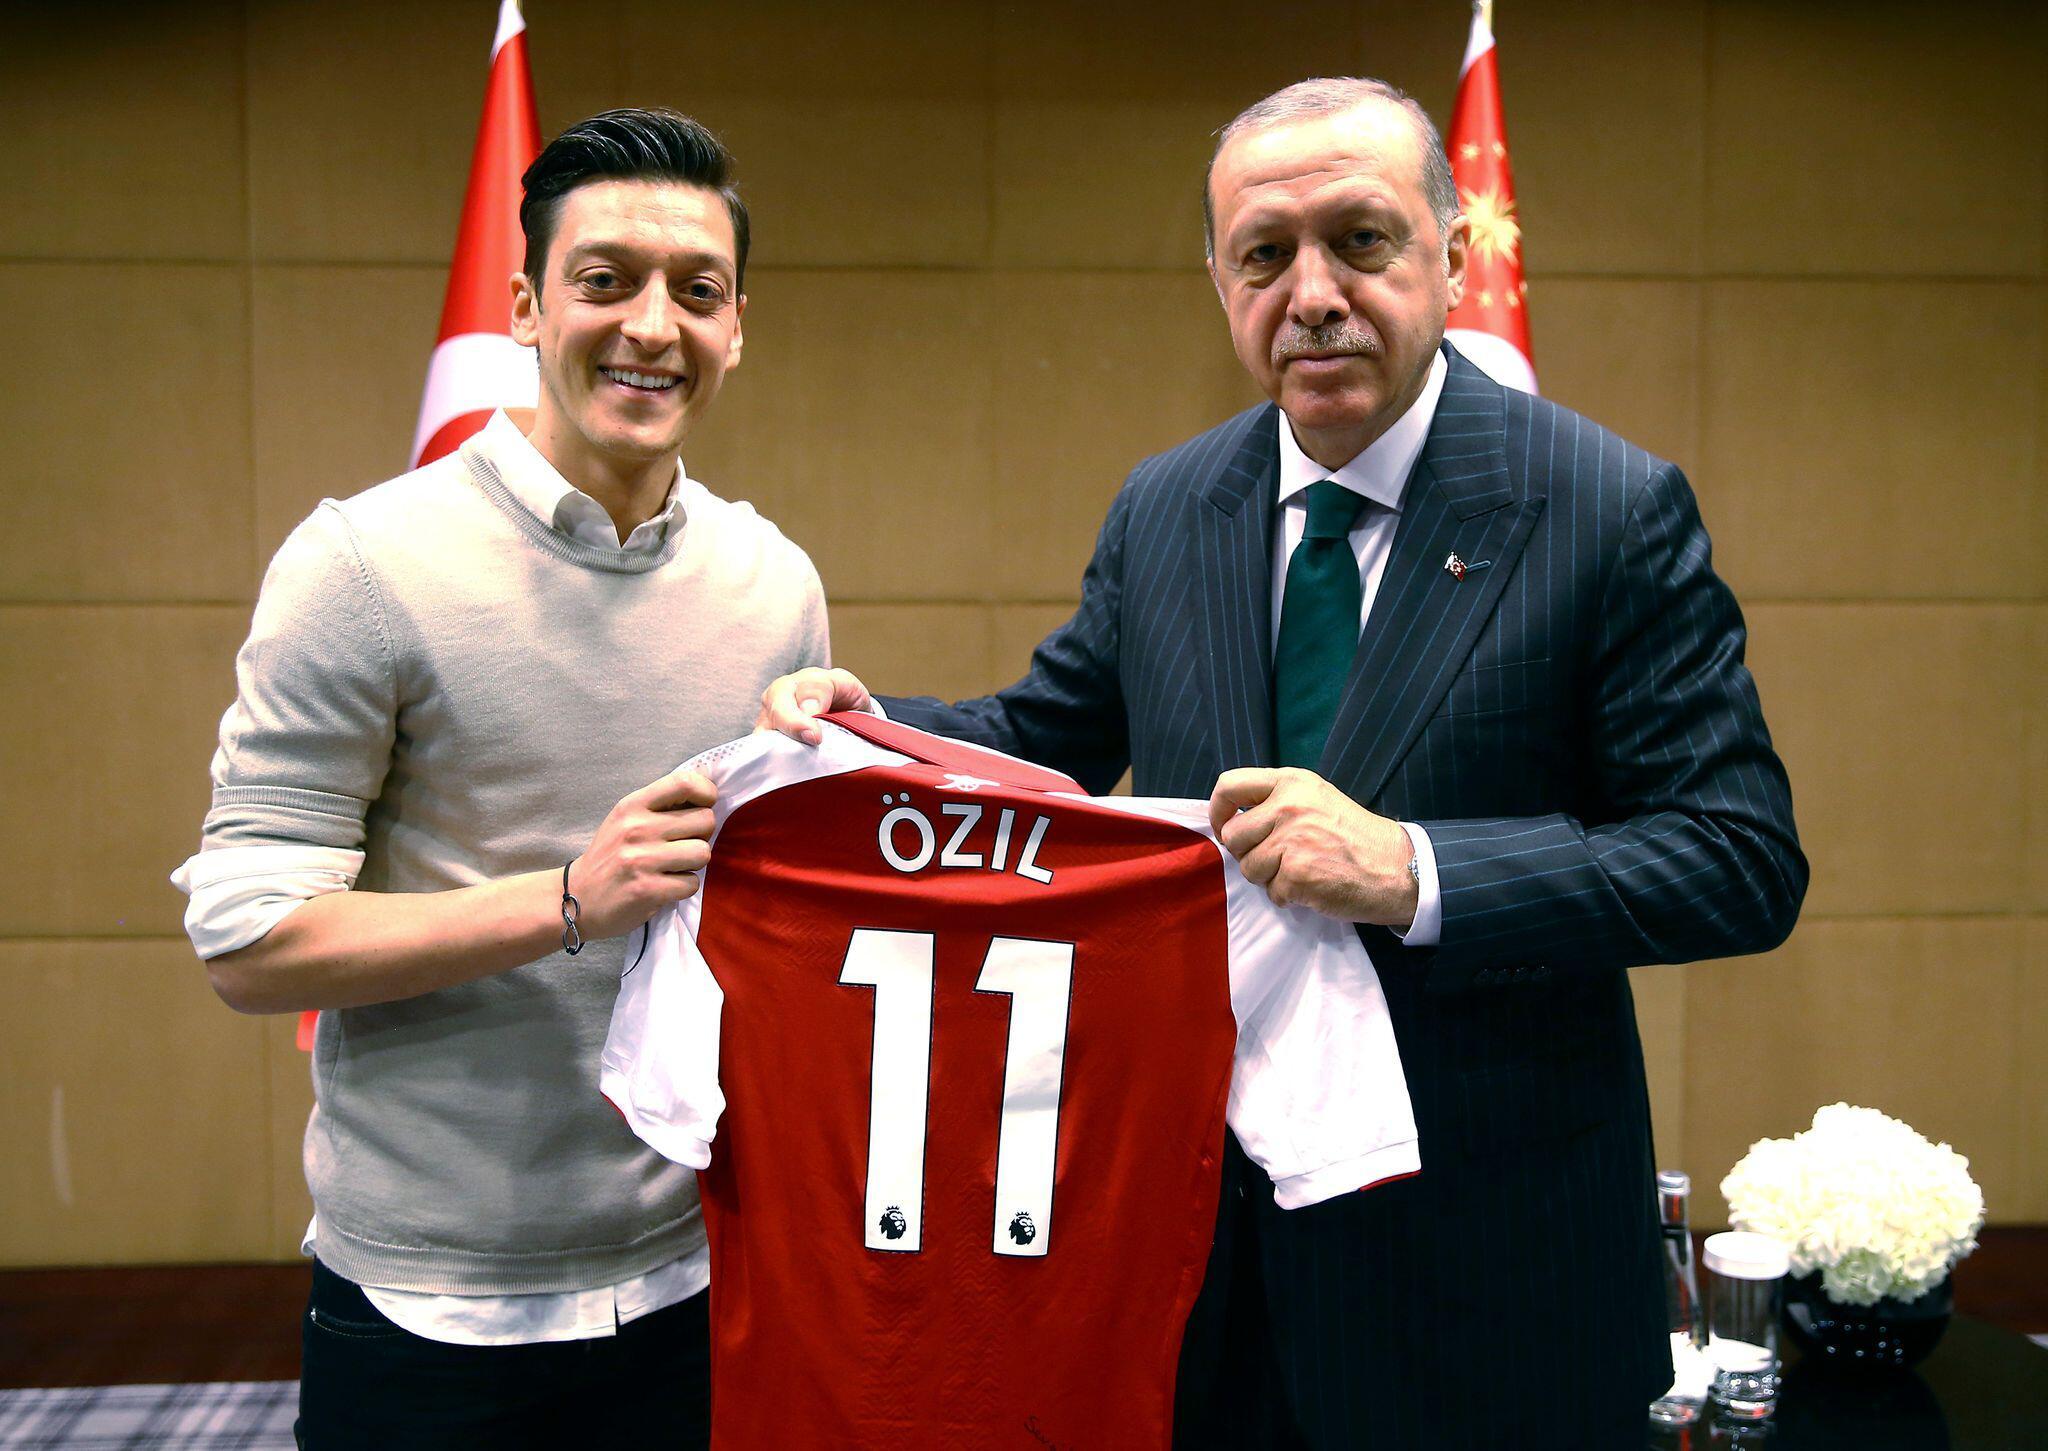 Bild zu Mesut Özil und Recep Tayyip Erdogan